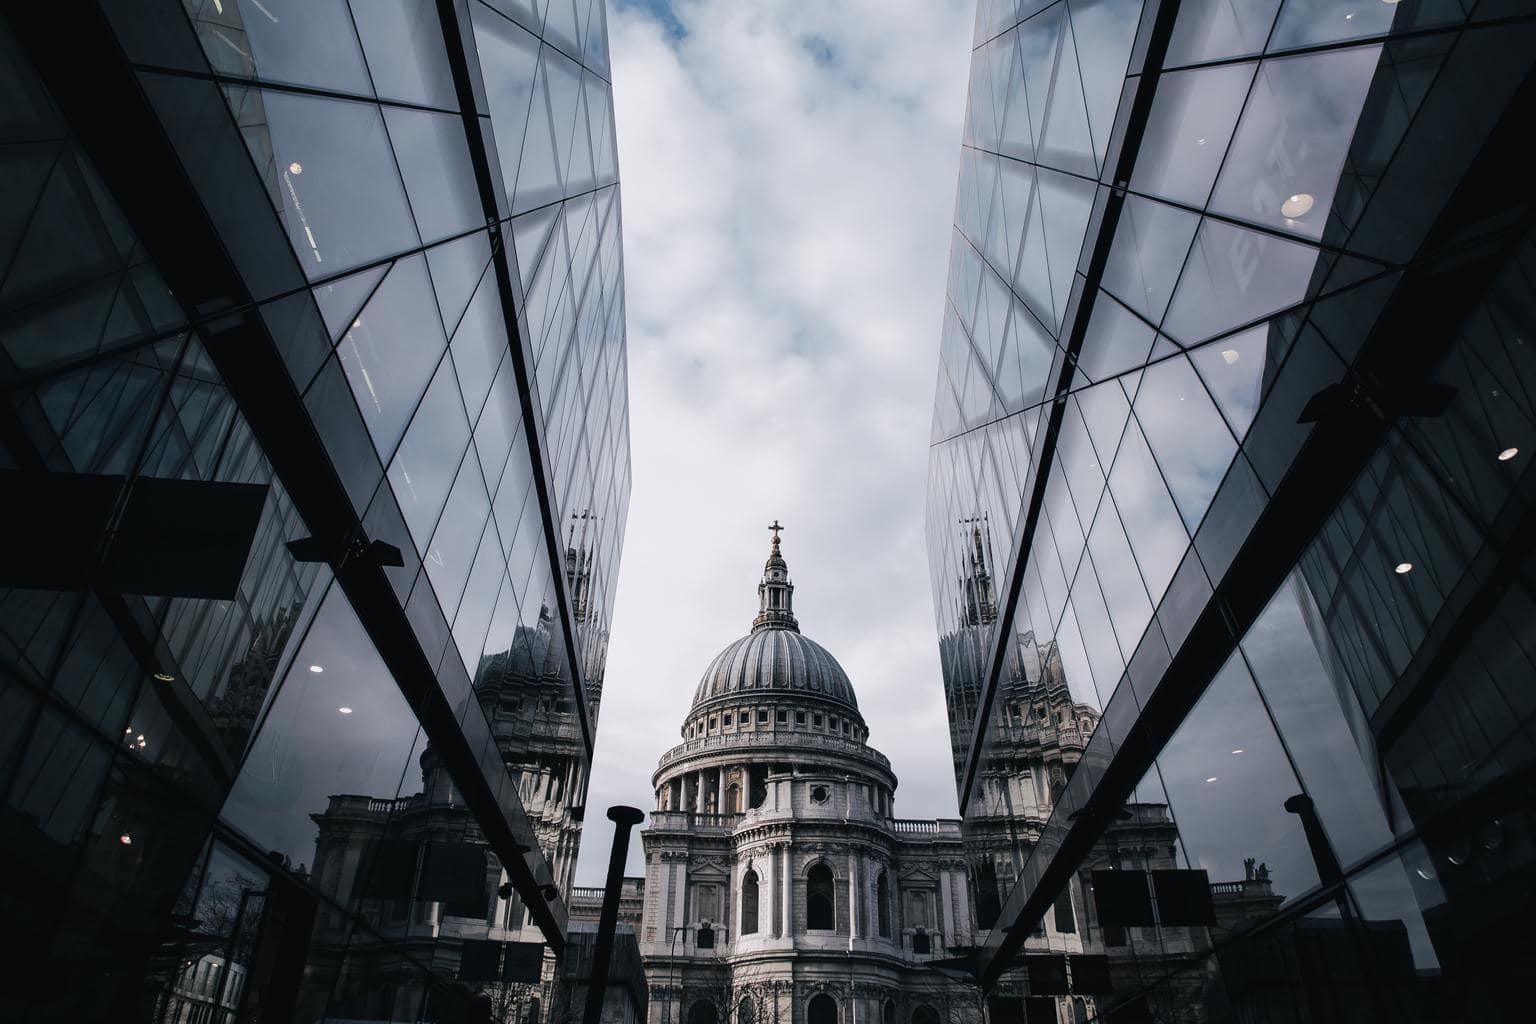 Reflejos en paisaje urbano